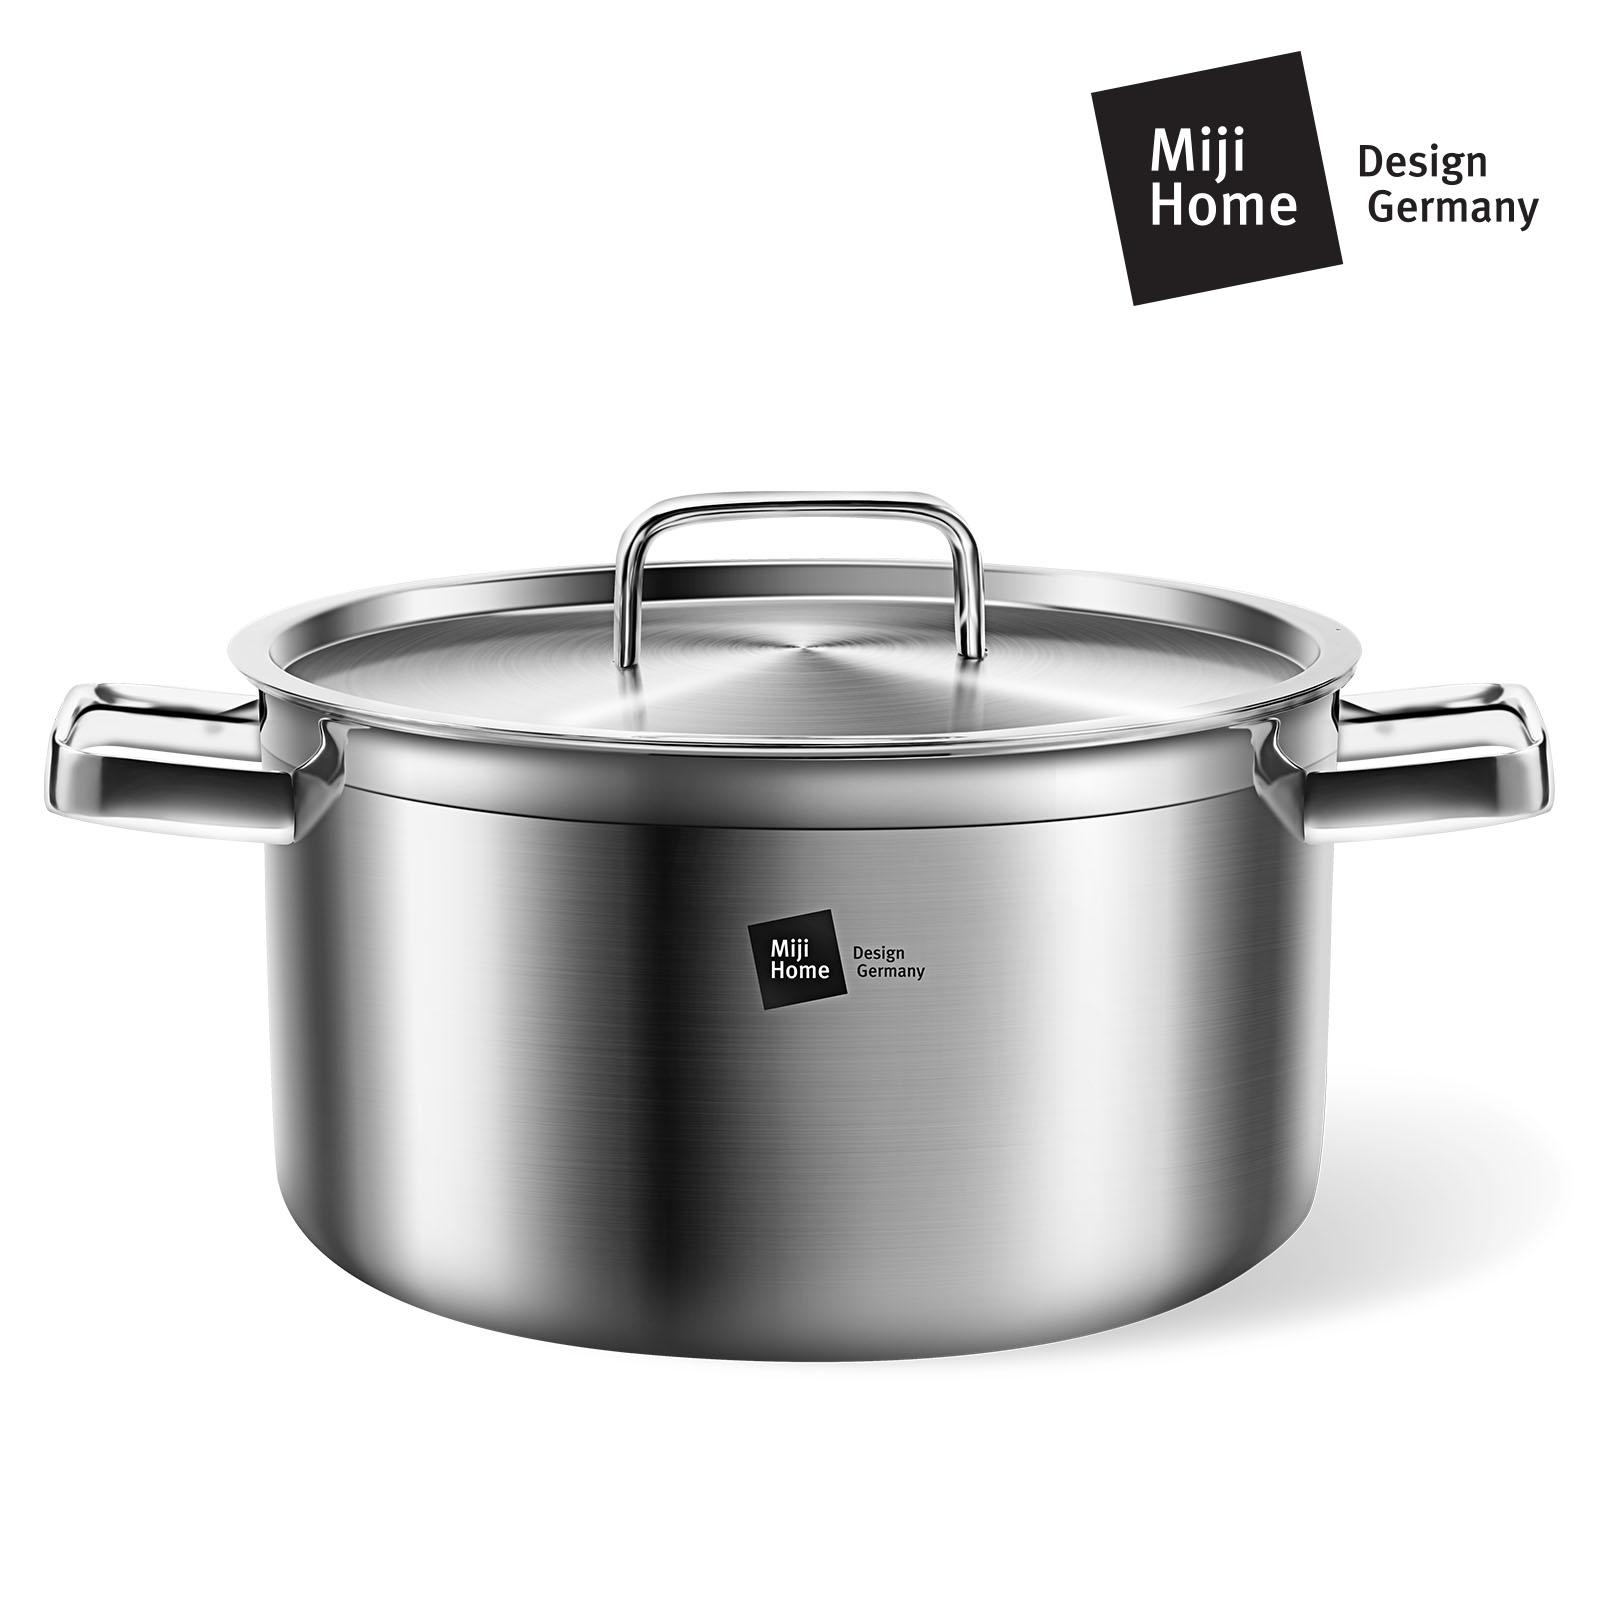 MIJI米技银河系列20cm不锈钢汤锅 加厚复合双耳汤锅